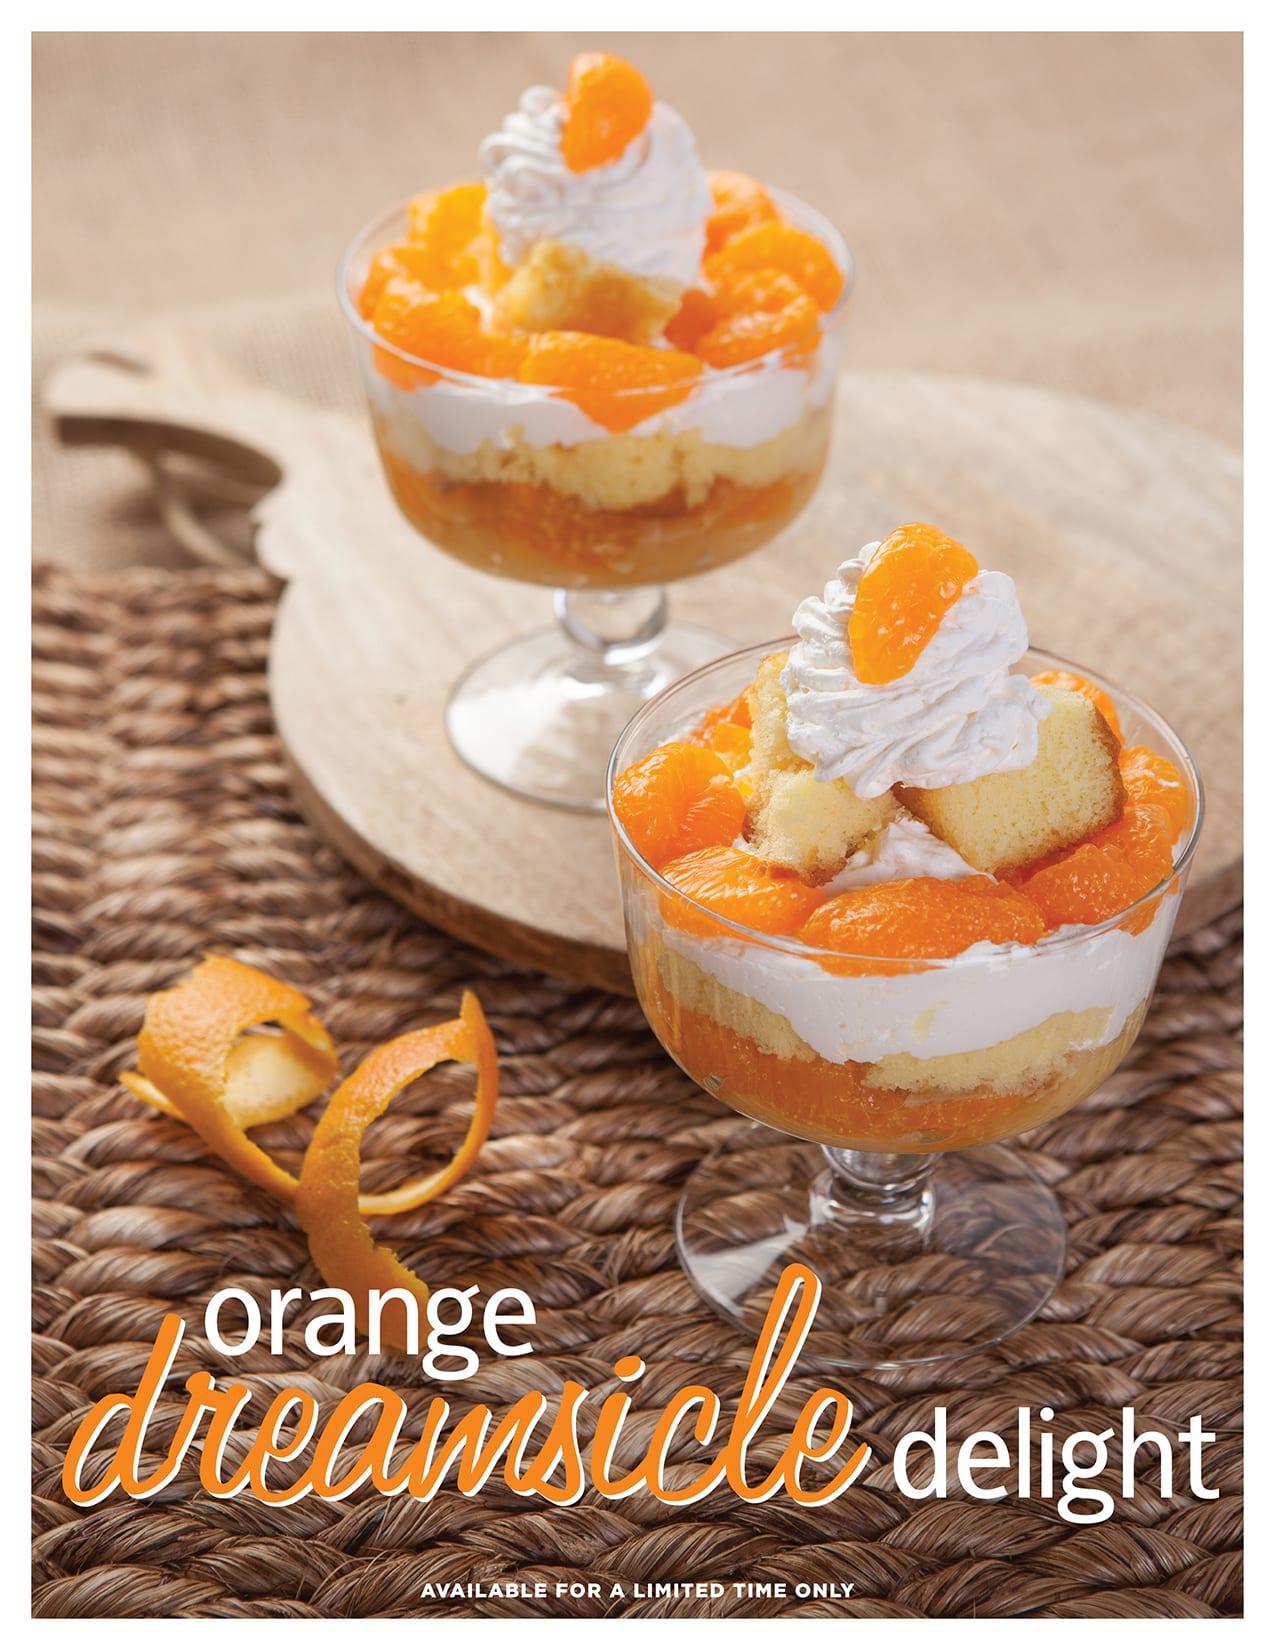 1601_january-LTOs_orange-dreamsicle-delight_8.5x11_static